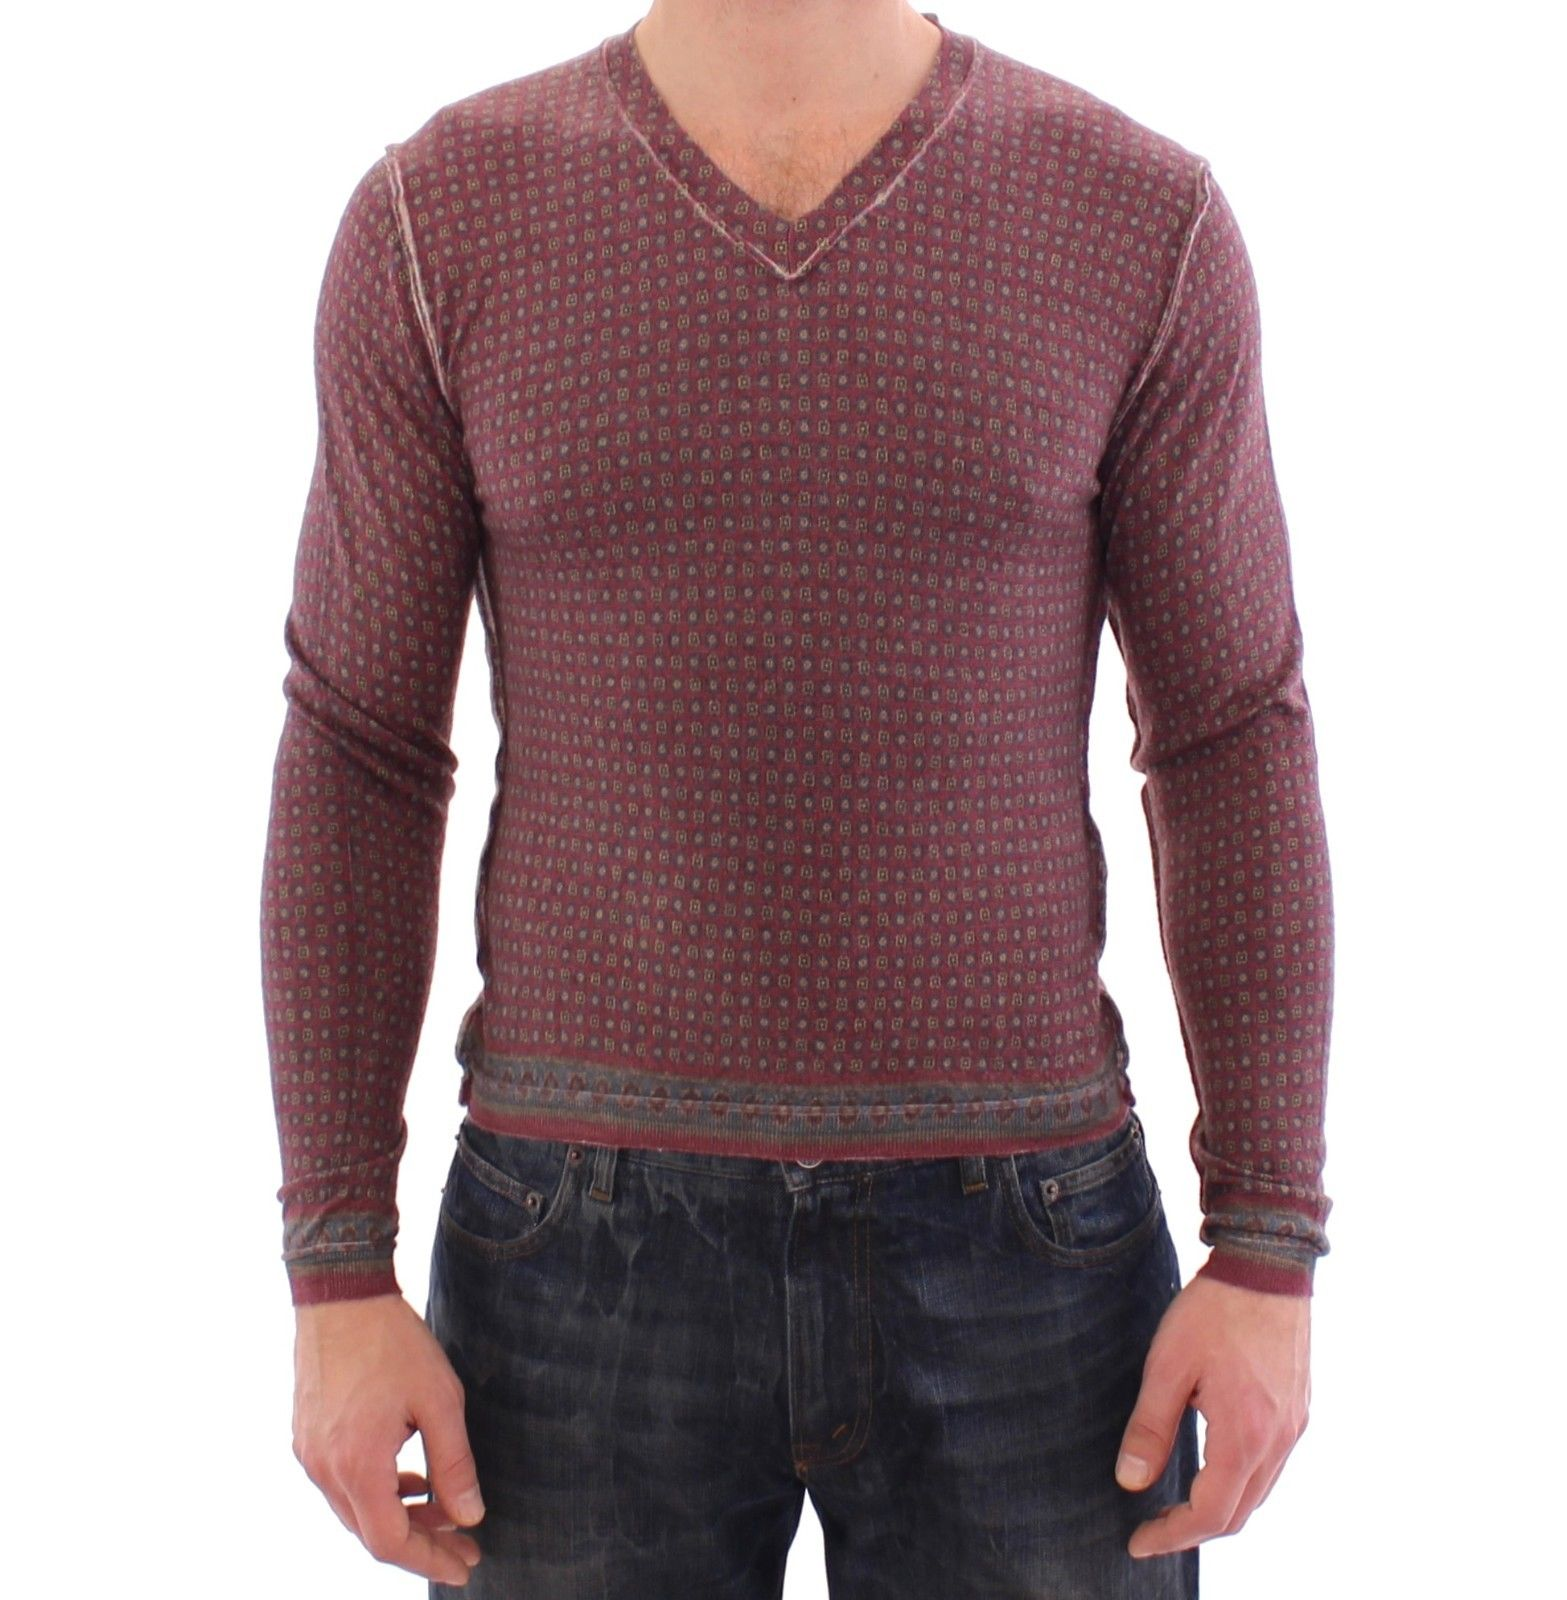 Dolce & Gabbana Men's Cashmere Sweater Pullover Multicolor GSS15153 - IT44 | XS